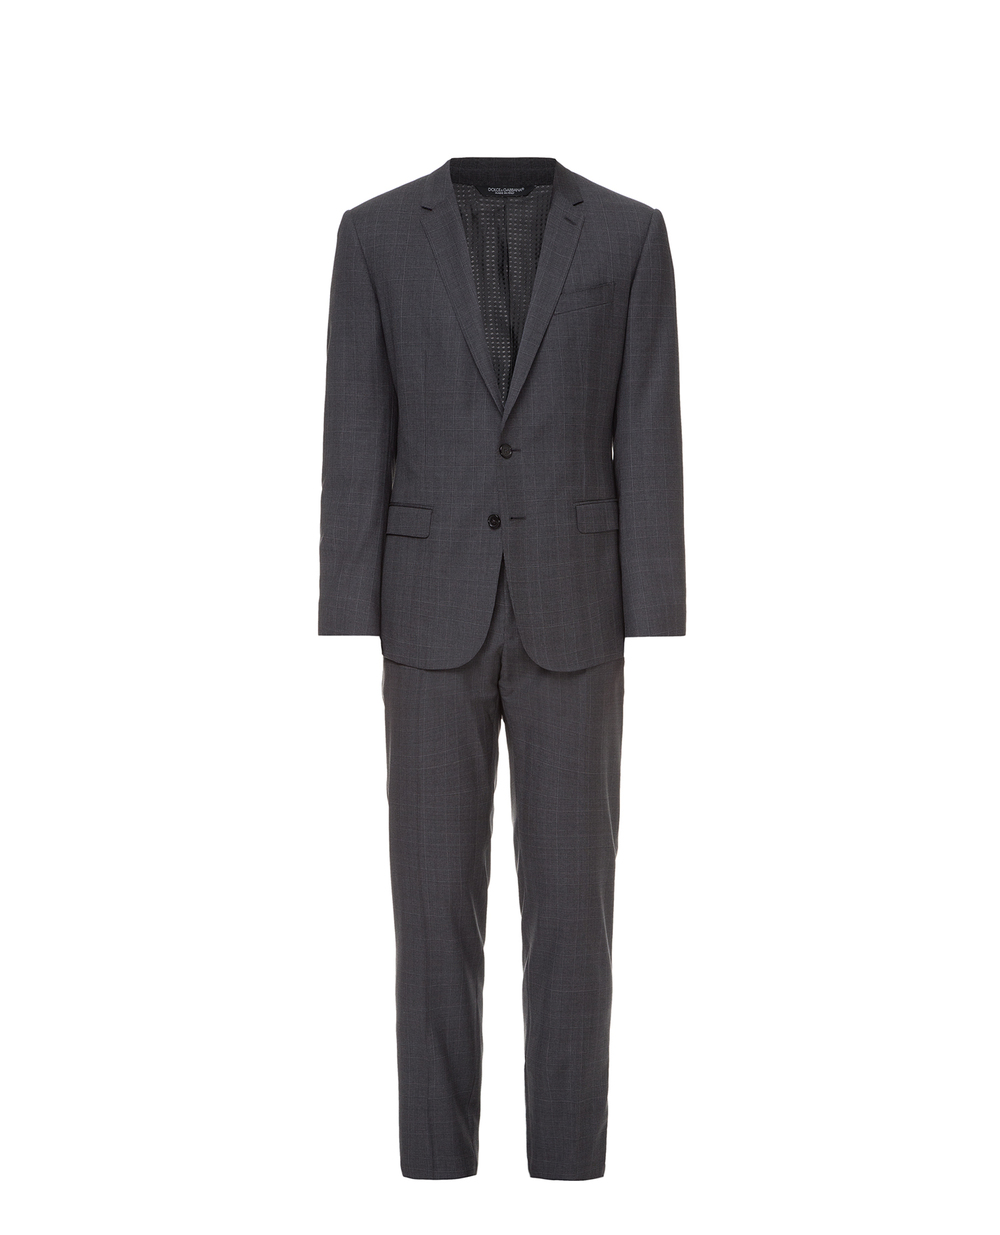 Шерстяной костюм в клетку Dolce&Gabbana GK13MT-FQ2IB — Kameron